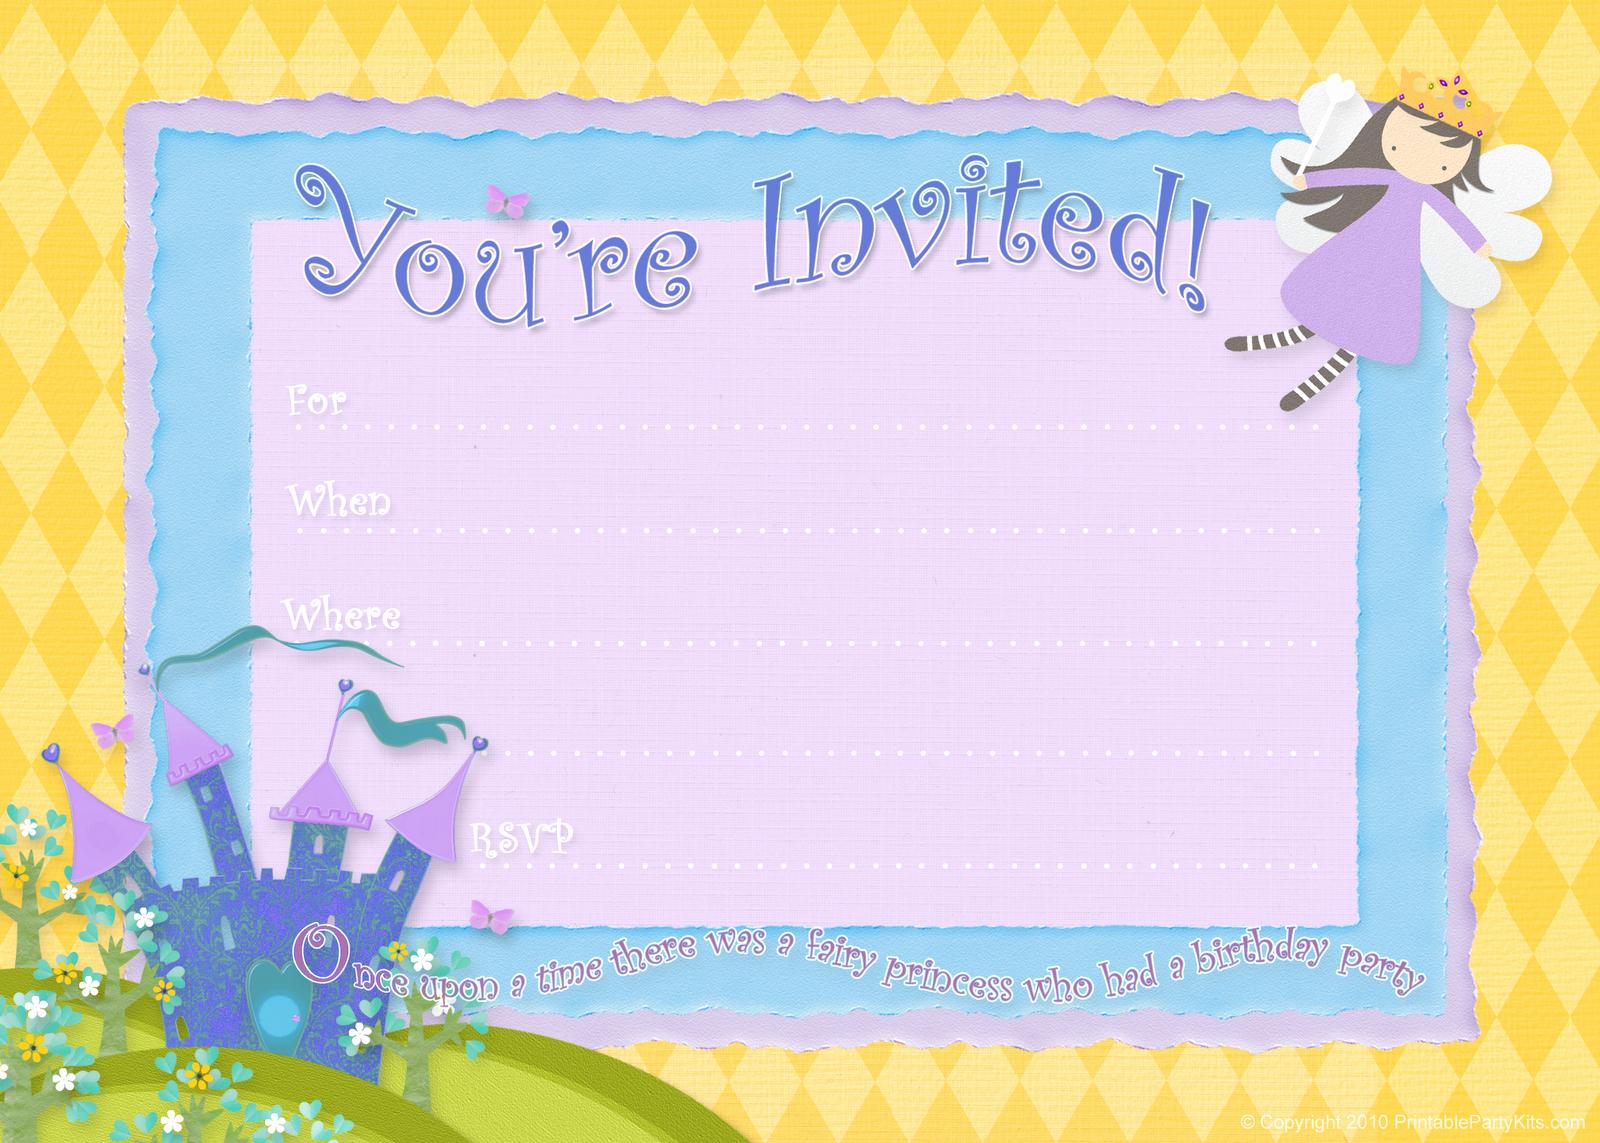 Party Invitation Templates Free Download Beautiful Free Birthday Party Invitations – Bagvania Free Printable